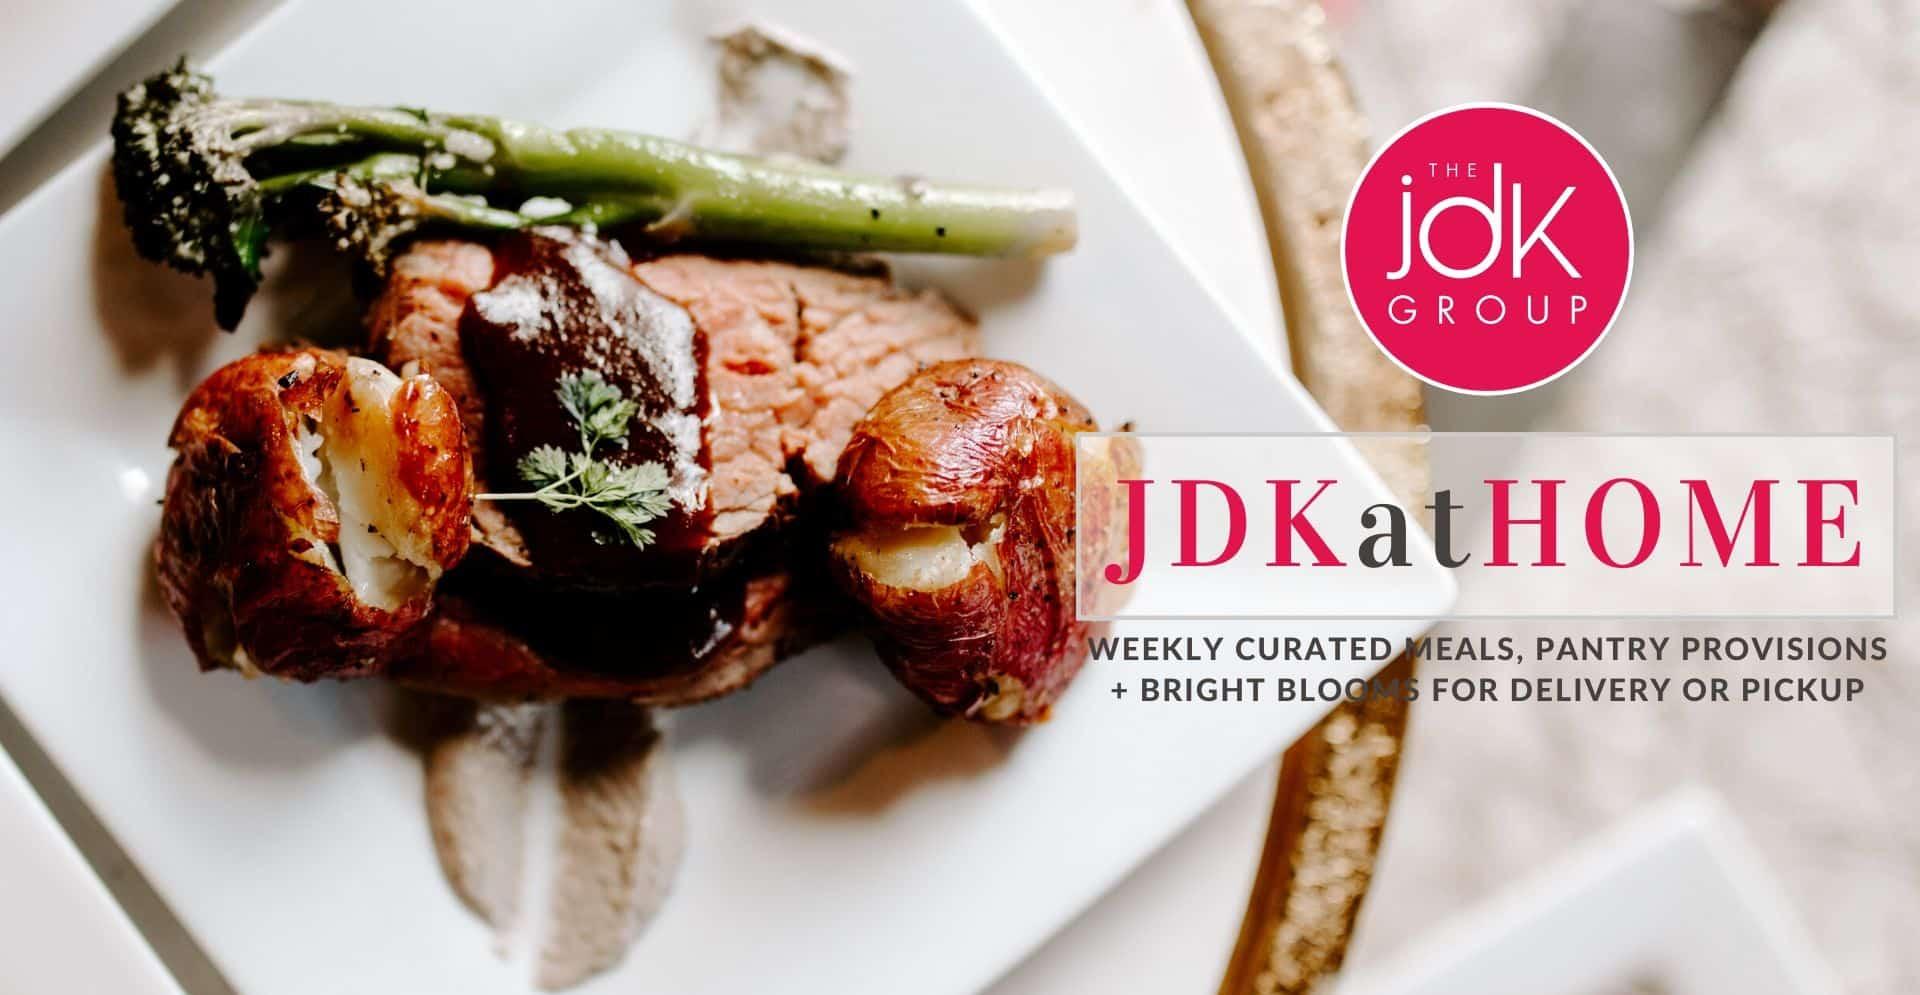 the-jdk-group-harrisburg-lancaster-york-best-event-caterer-JDK-at-home